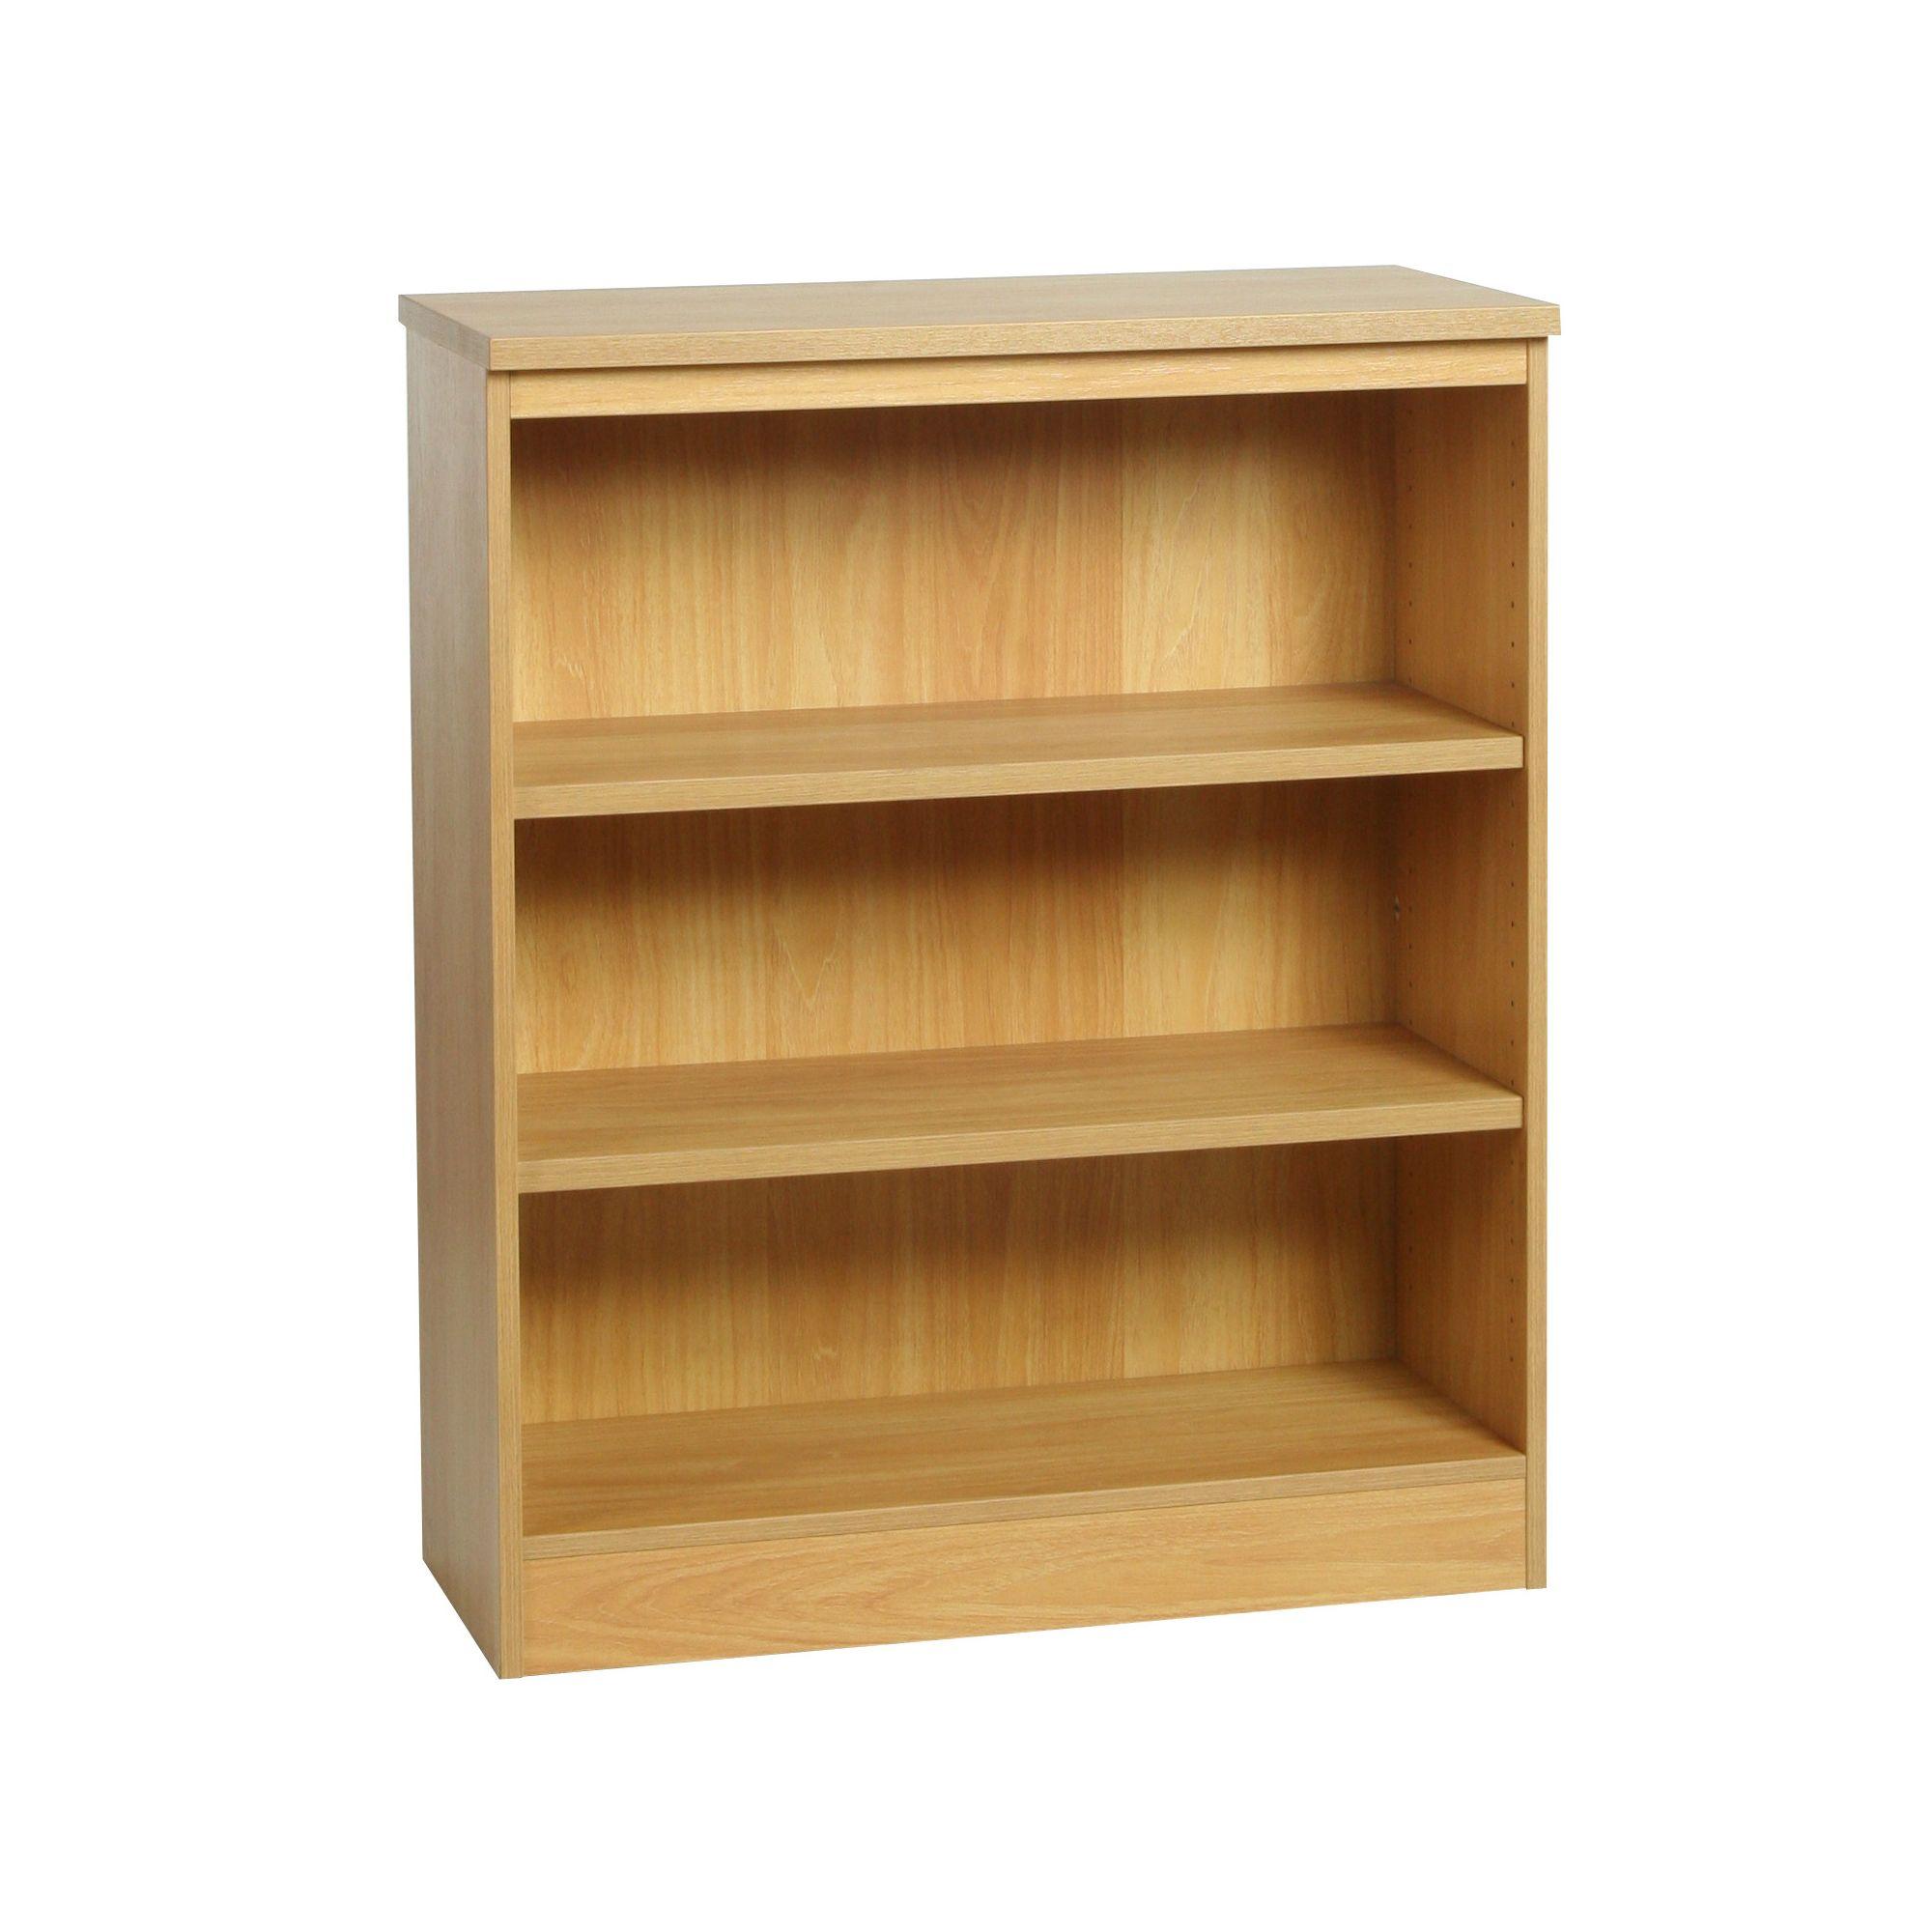 Enduro Three Shelf Wide Bookcase - Teak at Tesco Direct